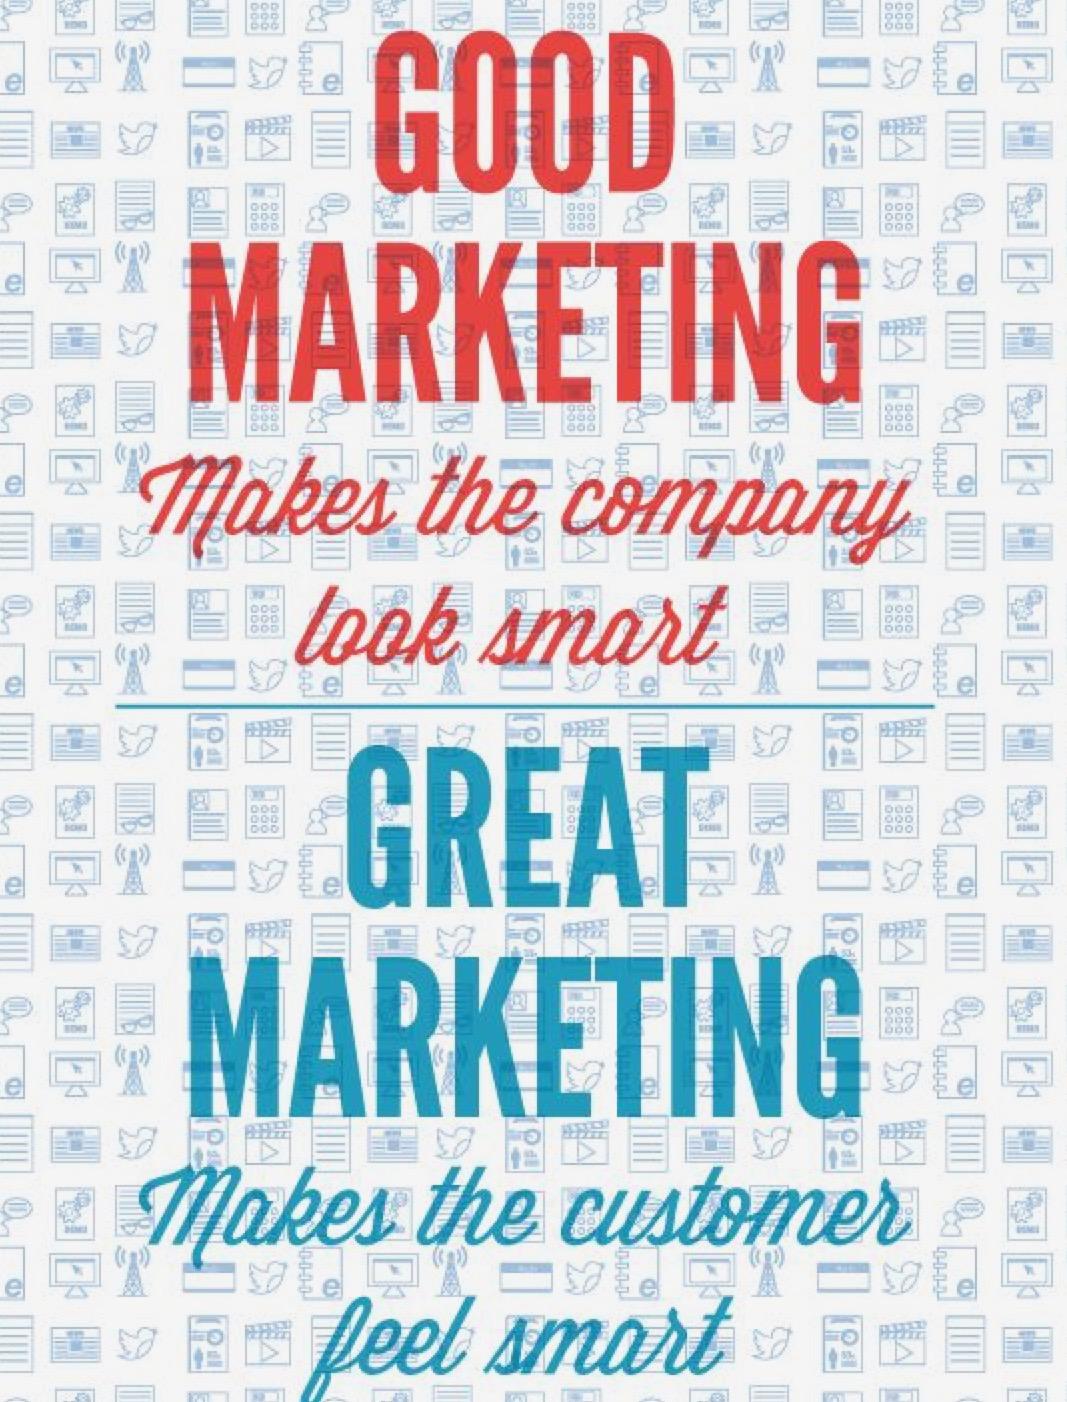 marketing image 2.jpg